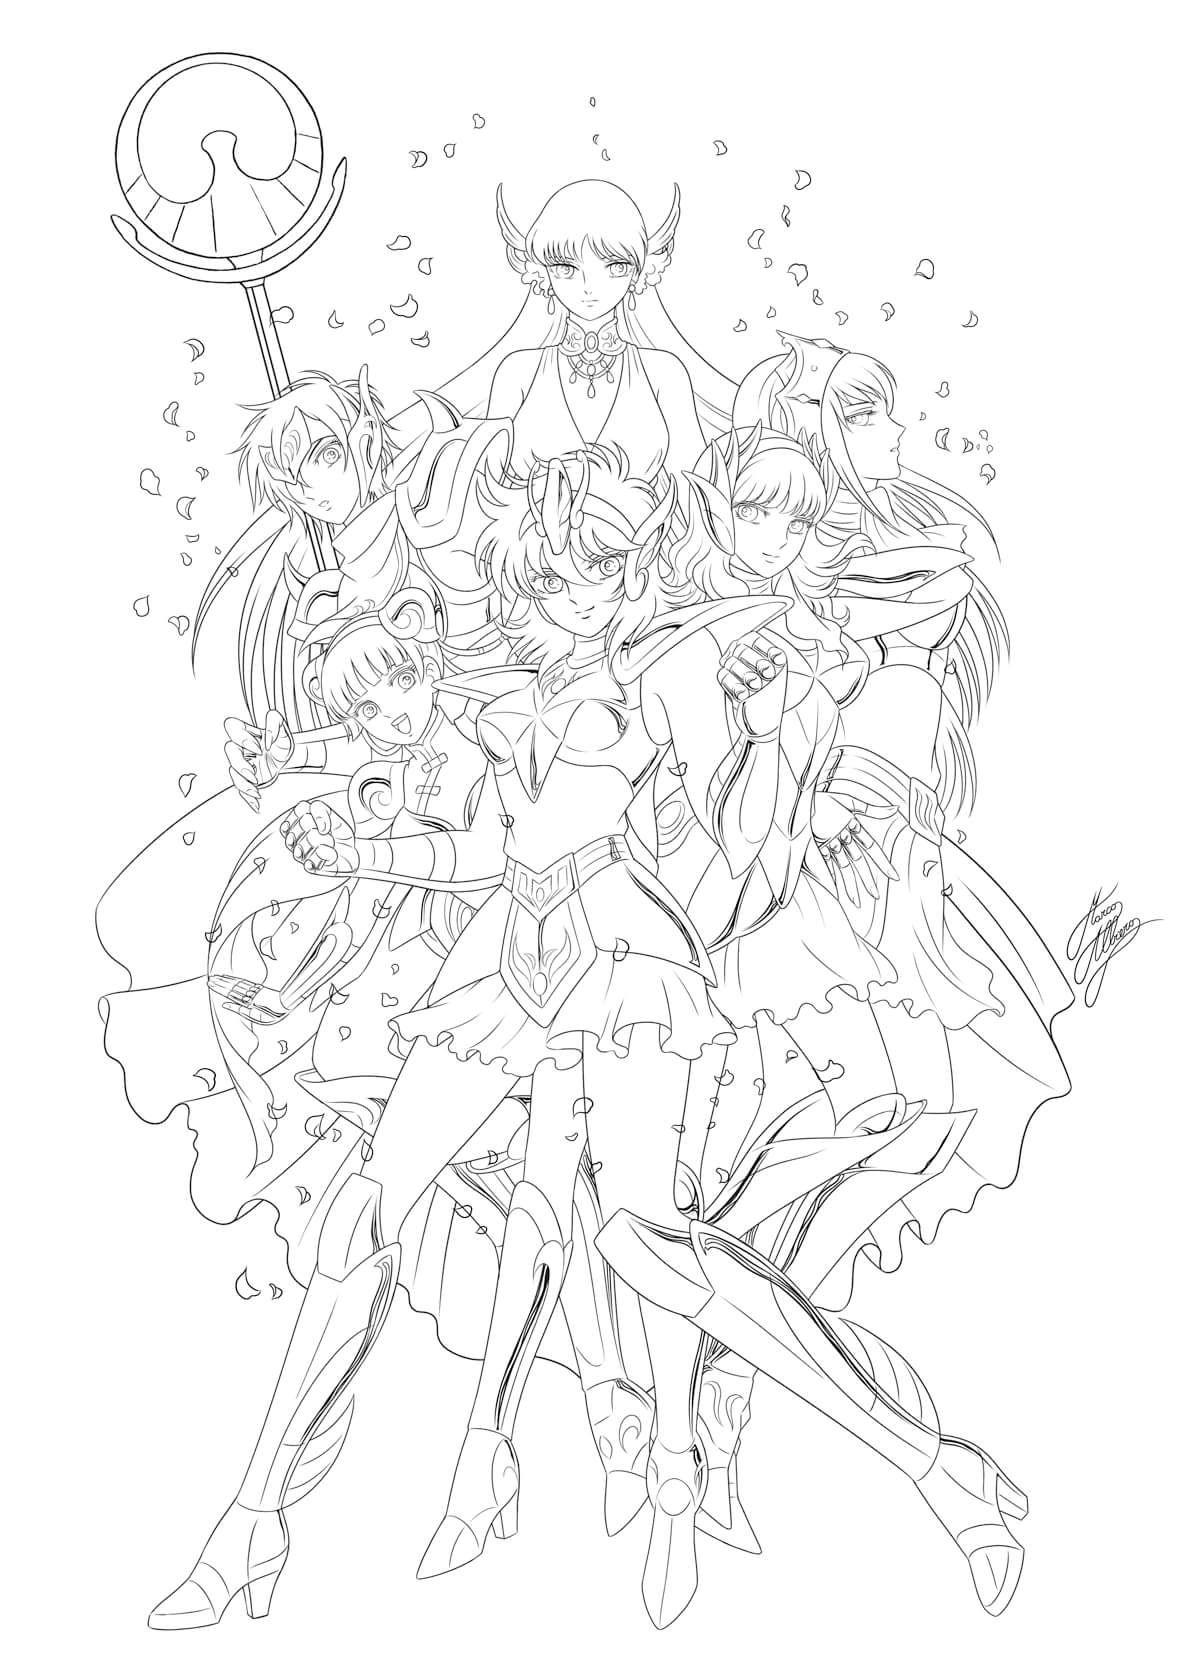 Voir Les Contributions Aldebaran Anime Saint Seiya